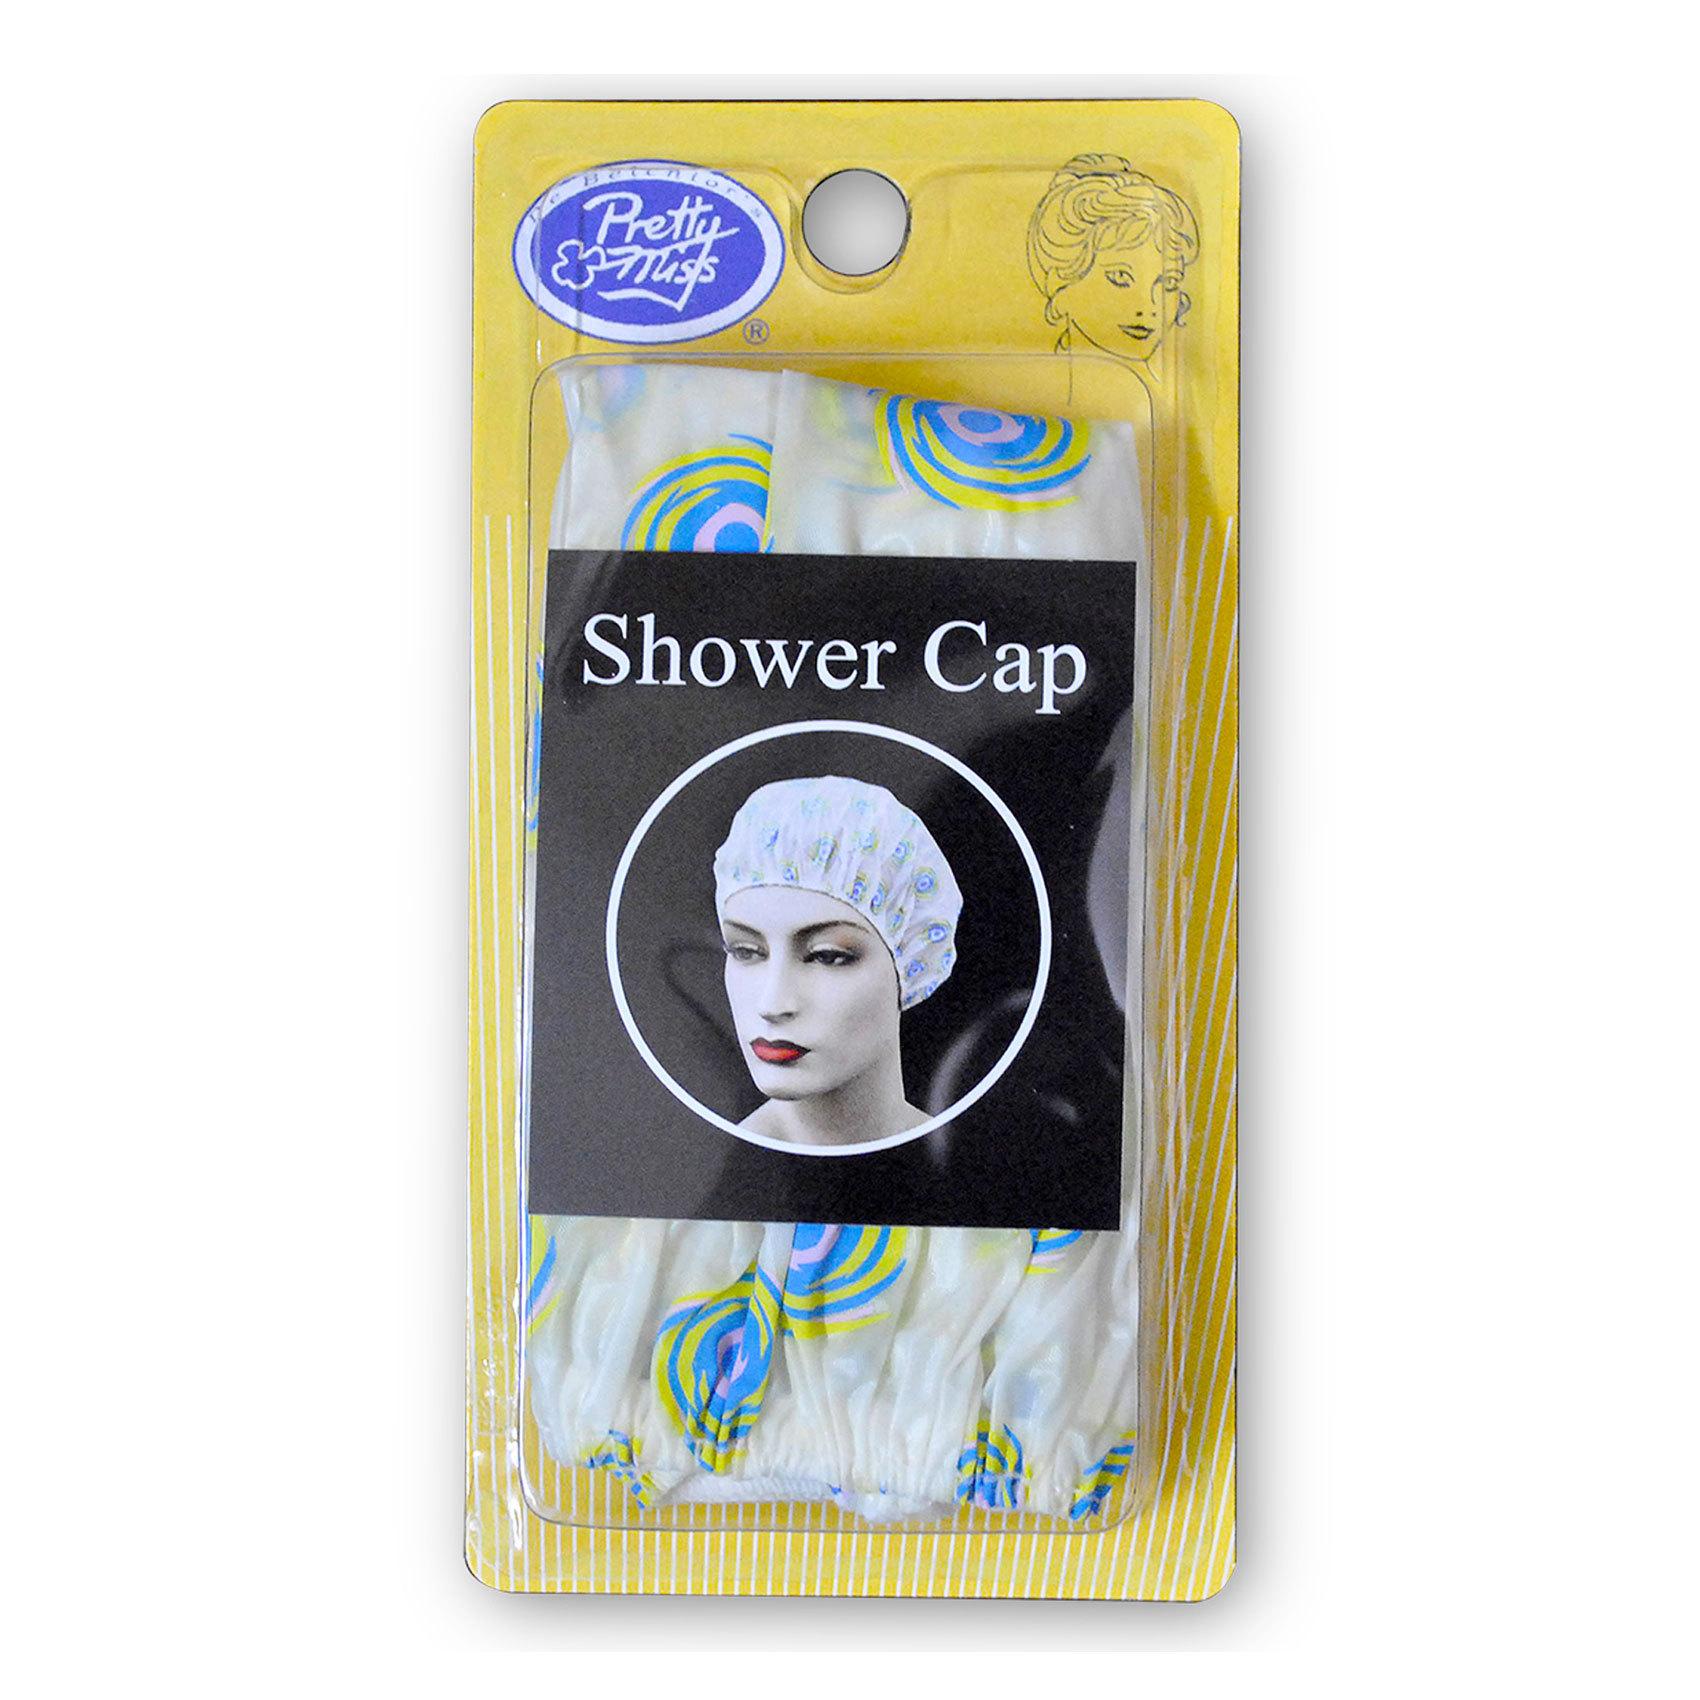 PRETTY MISS SHOWER CAP